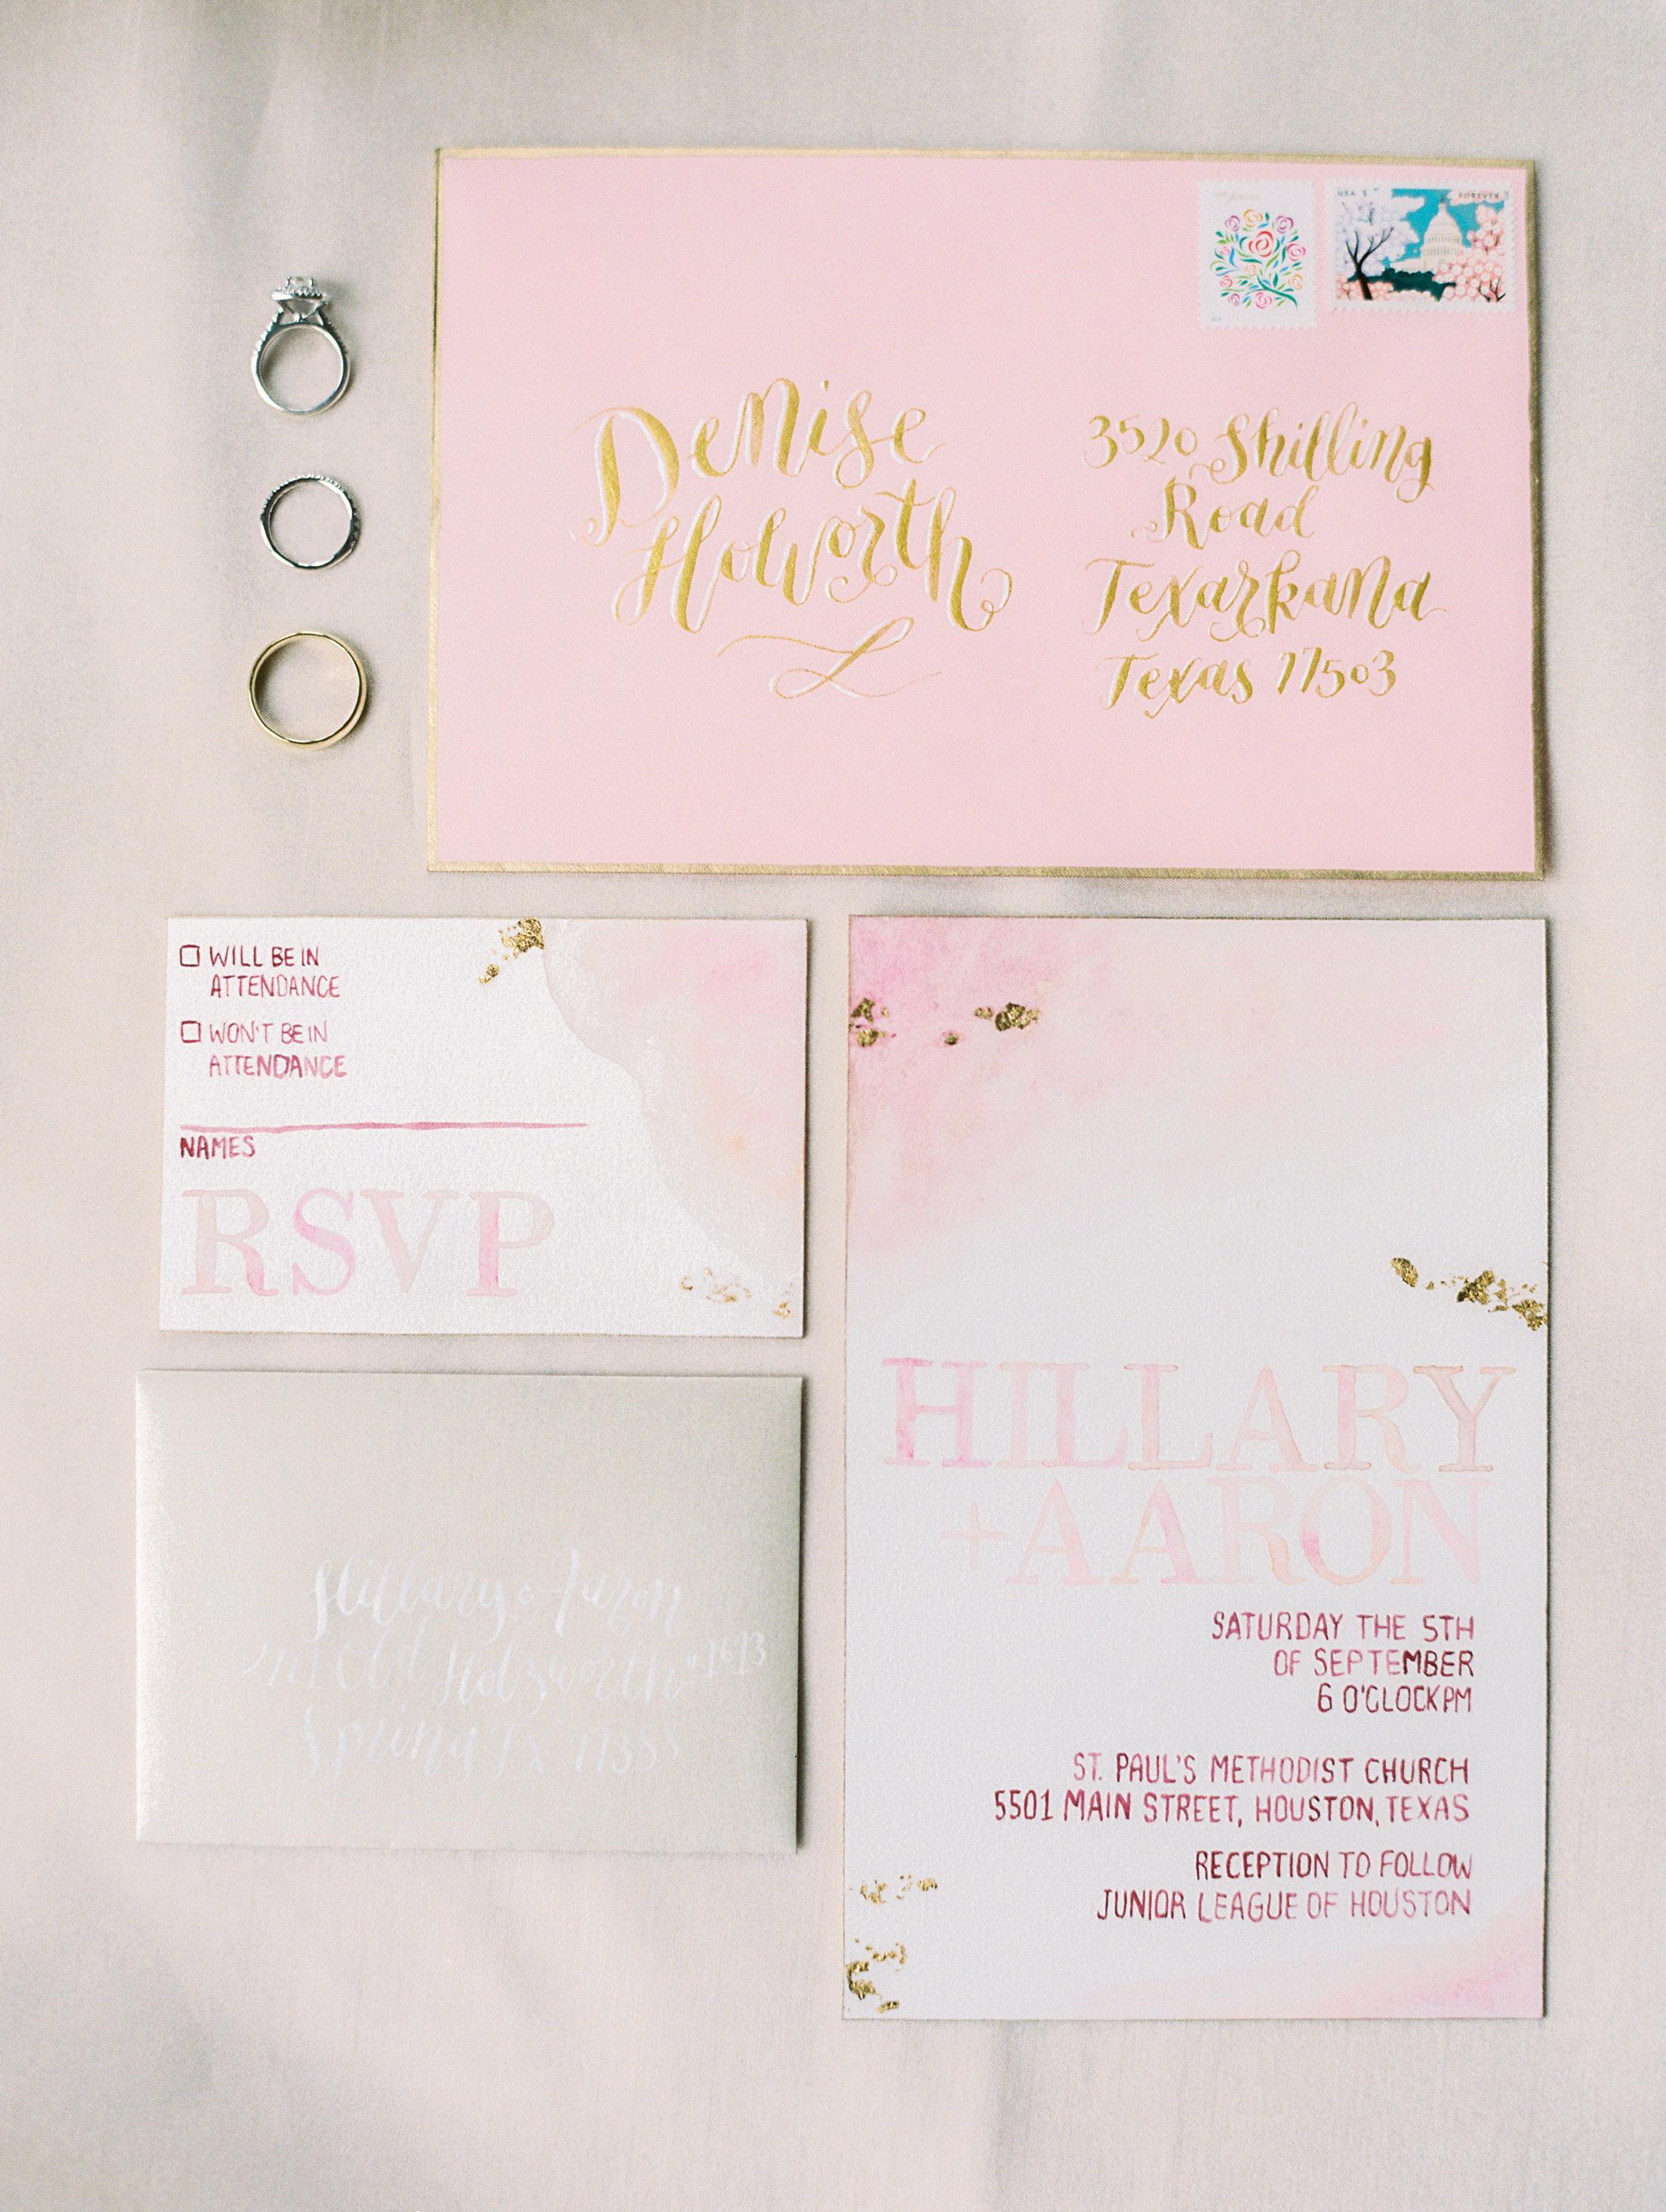 Dana-Fernandez-Photography-Weddings-in-Houston-Magazine-feature-Houston-wedding-photographer-film-2.jpg